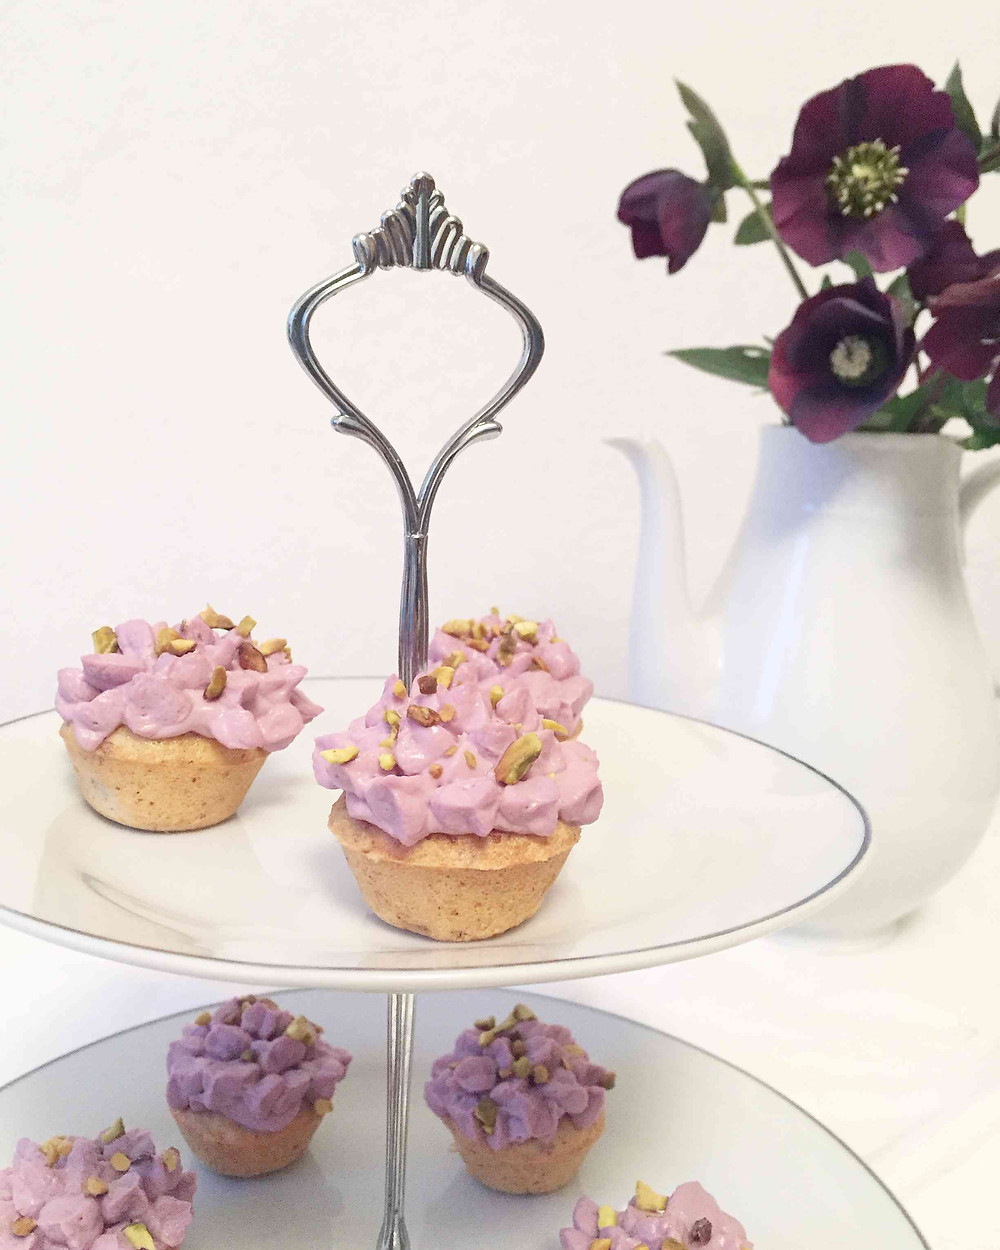 black fruits cupcakes (cupcakes aux fruits noirs)